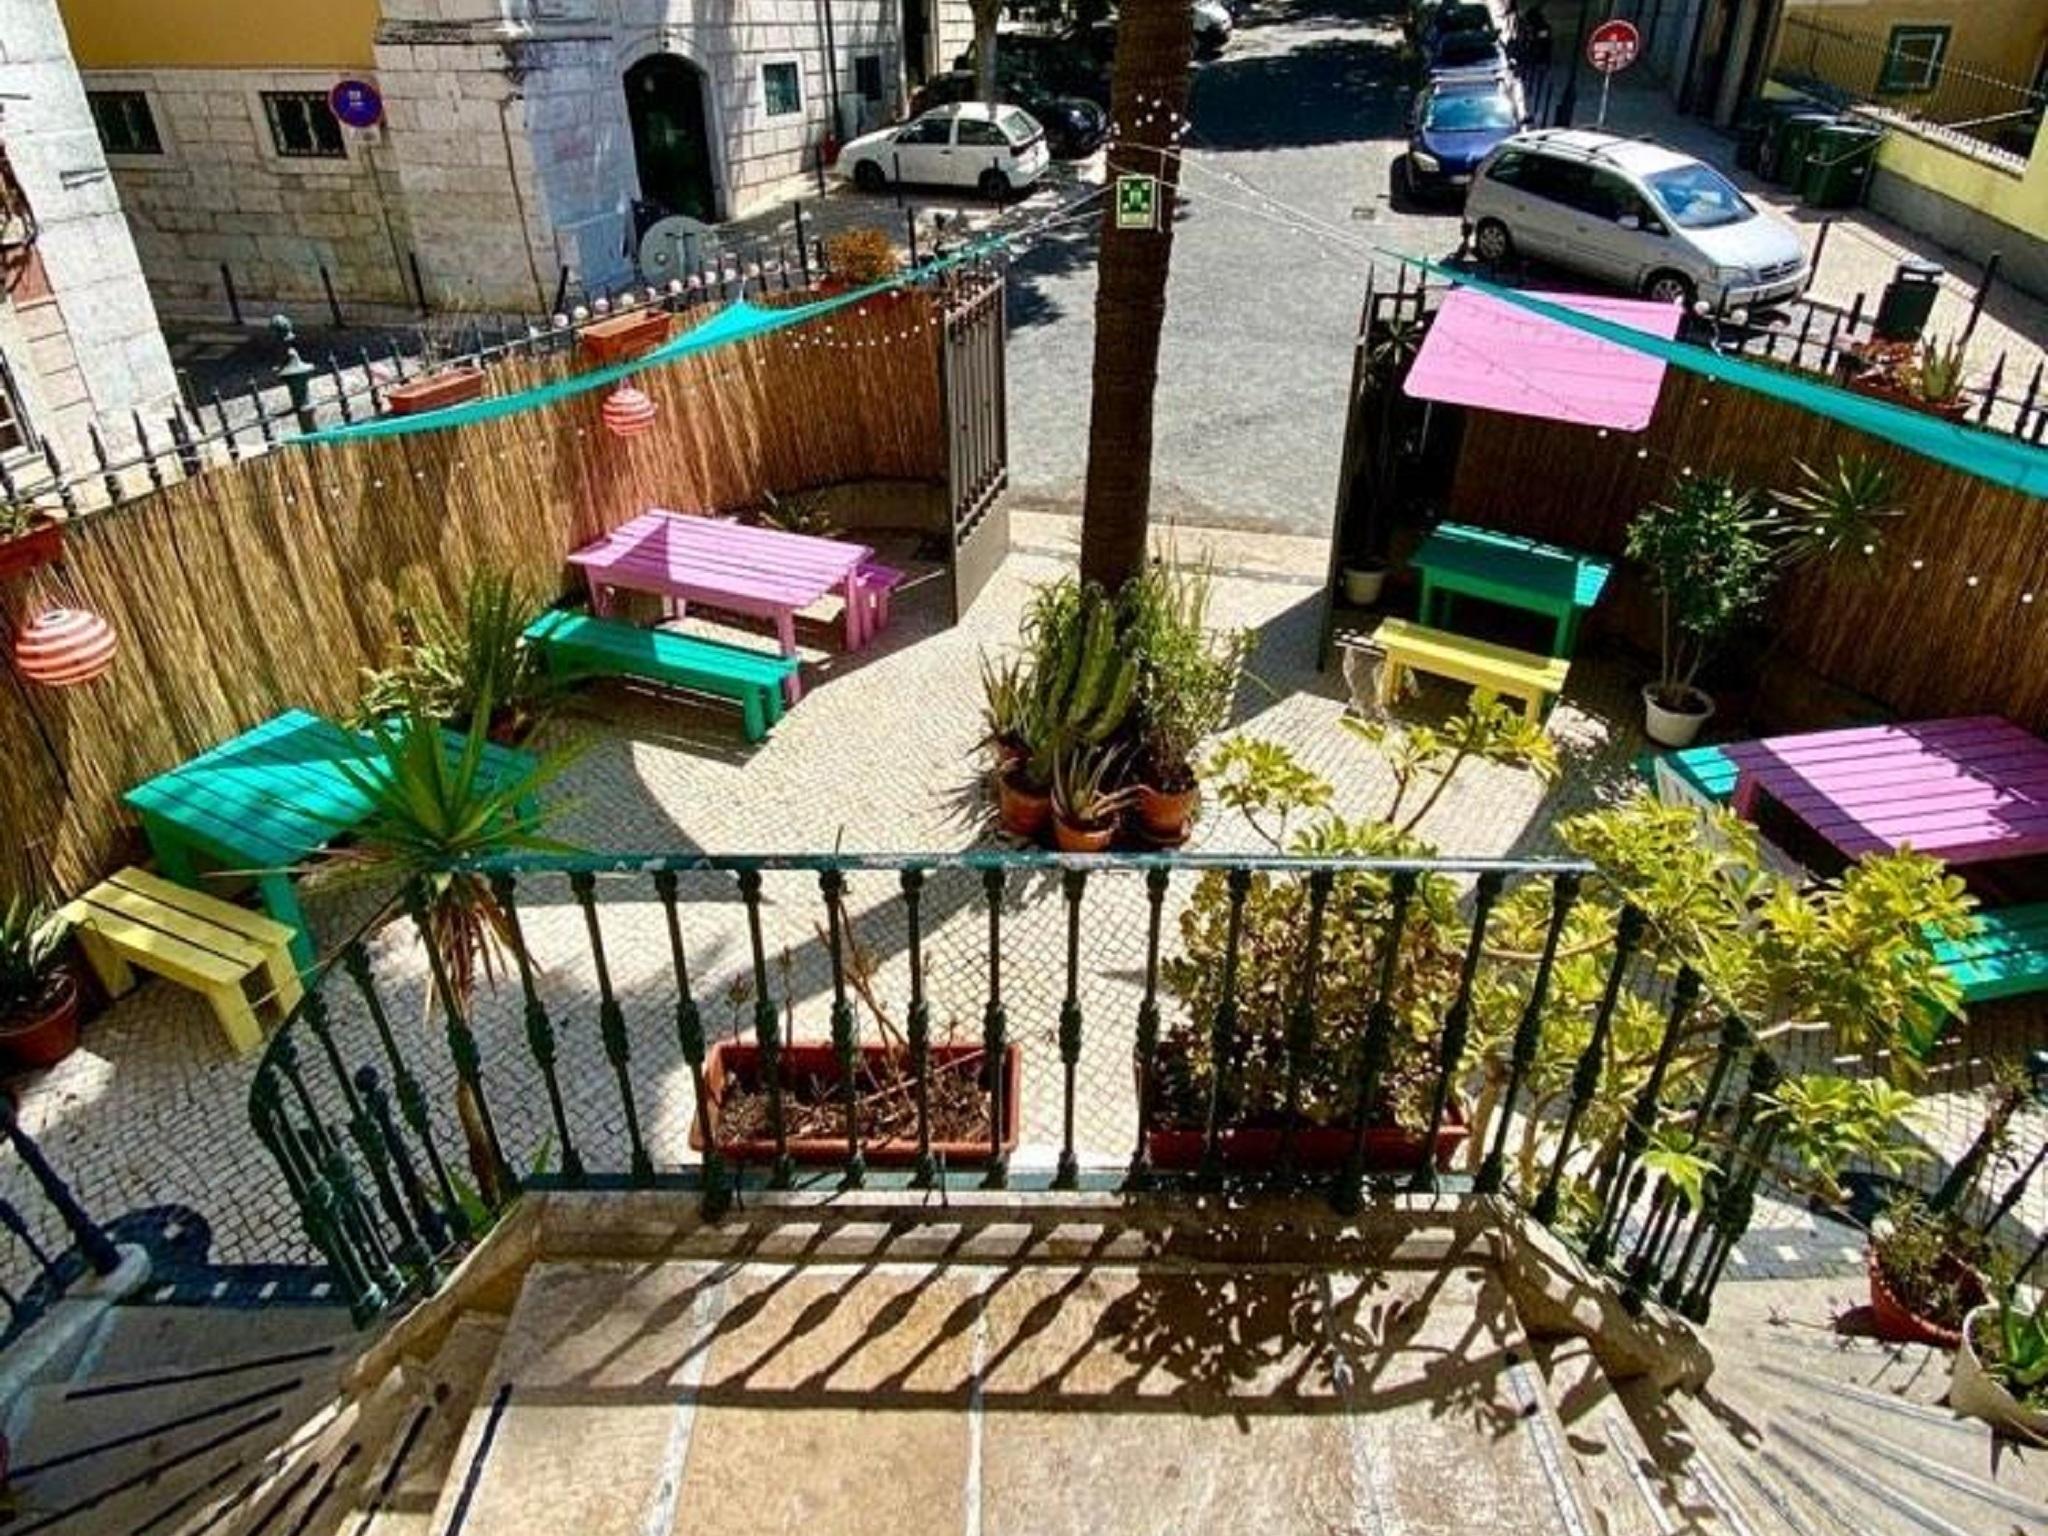 Tutti Frutti: podia ser Miami mas é um bar na Bica